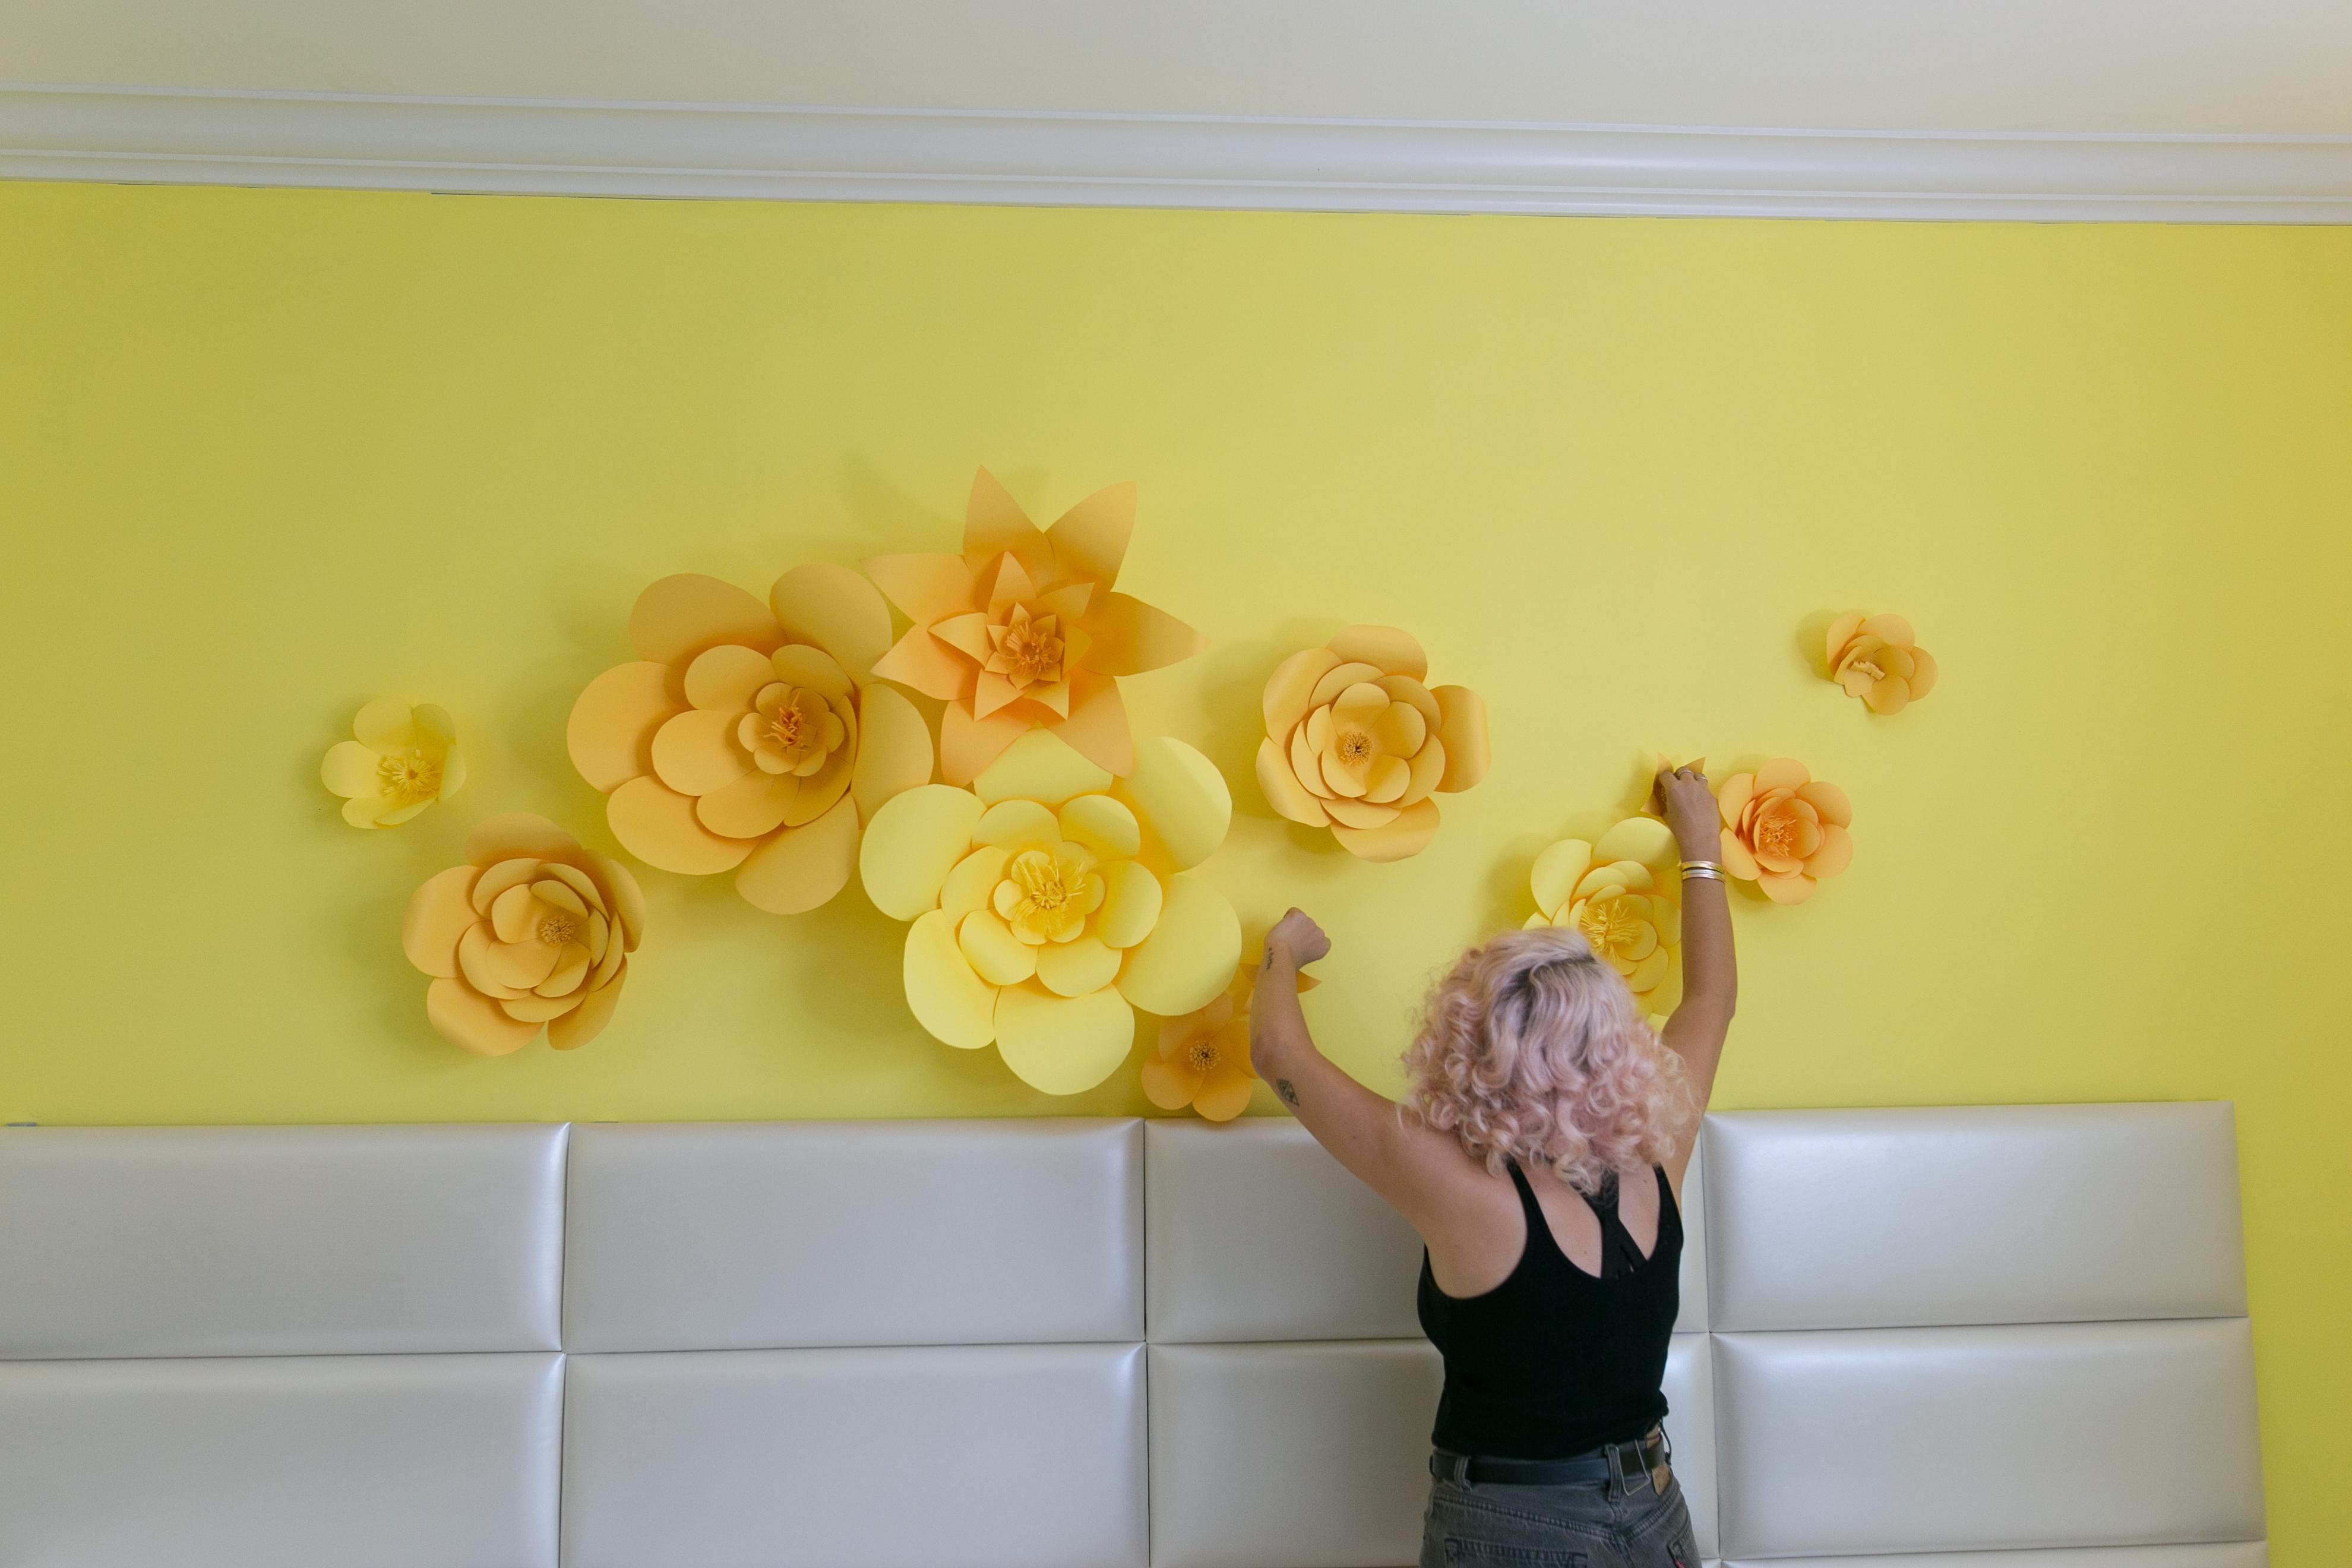 Mr. Kate - DIY Giant Paper Flowers